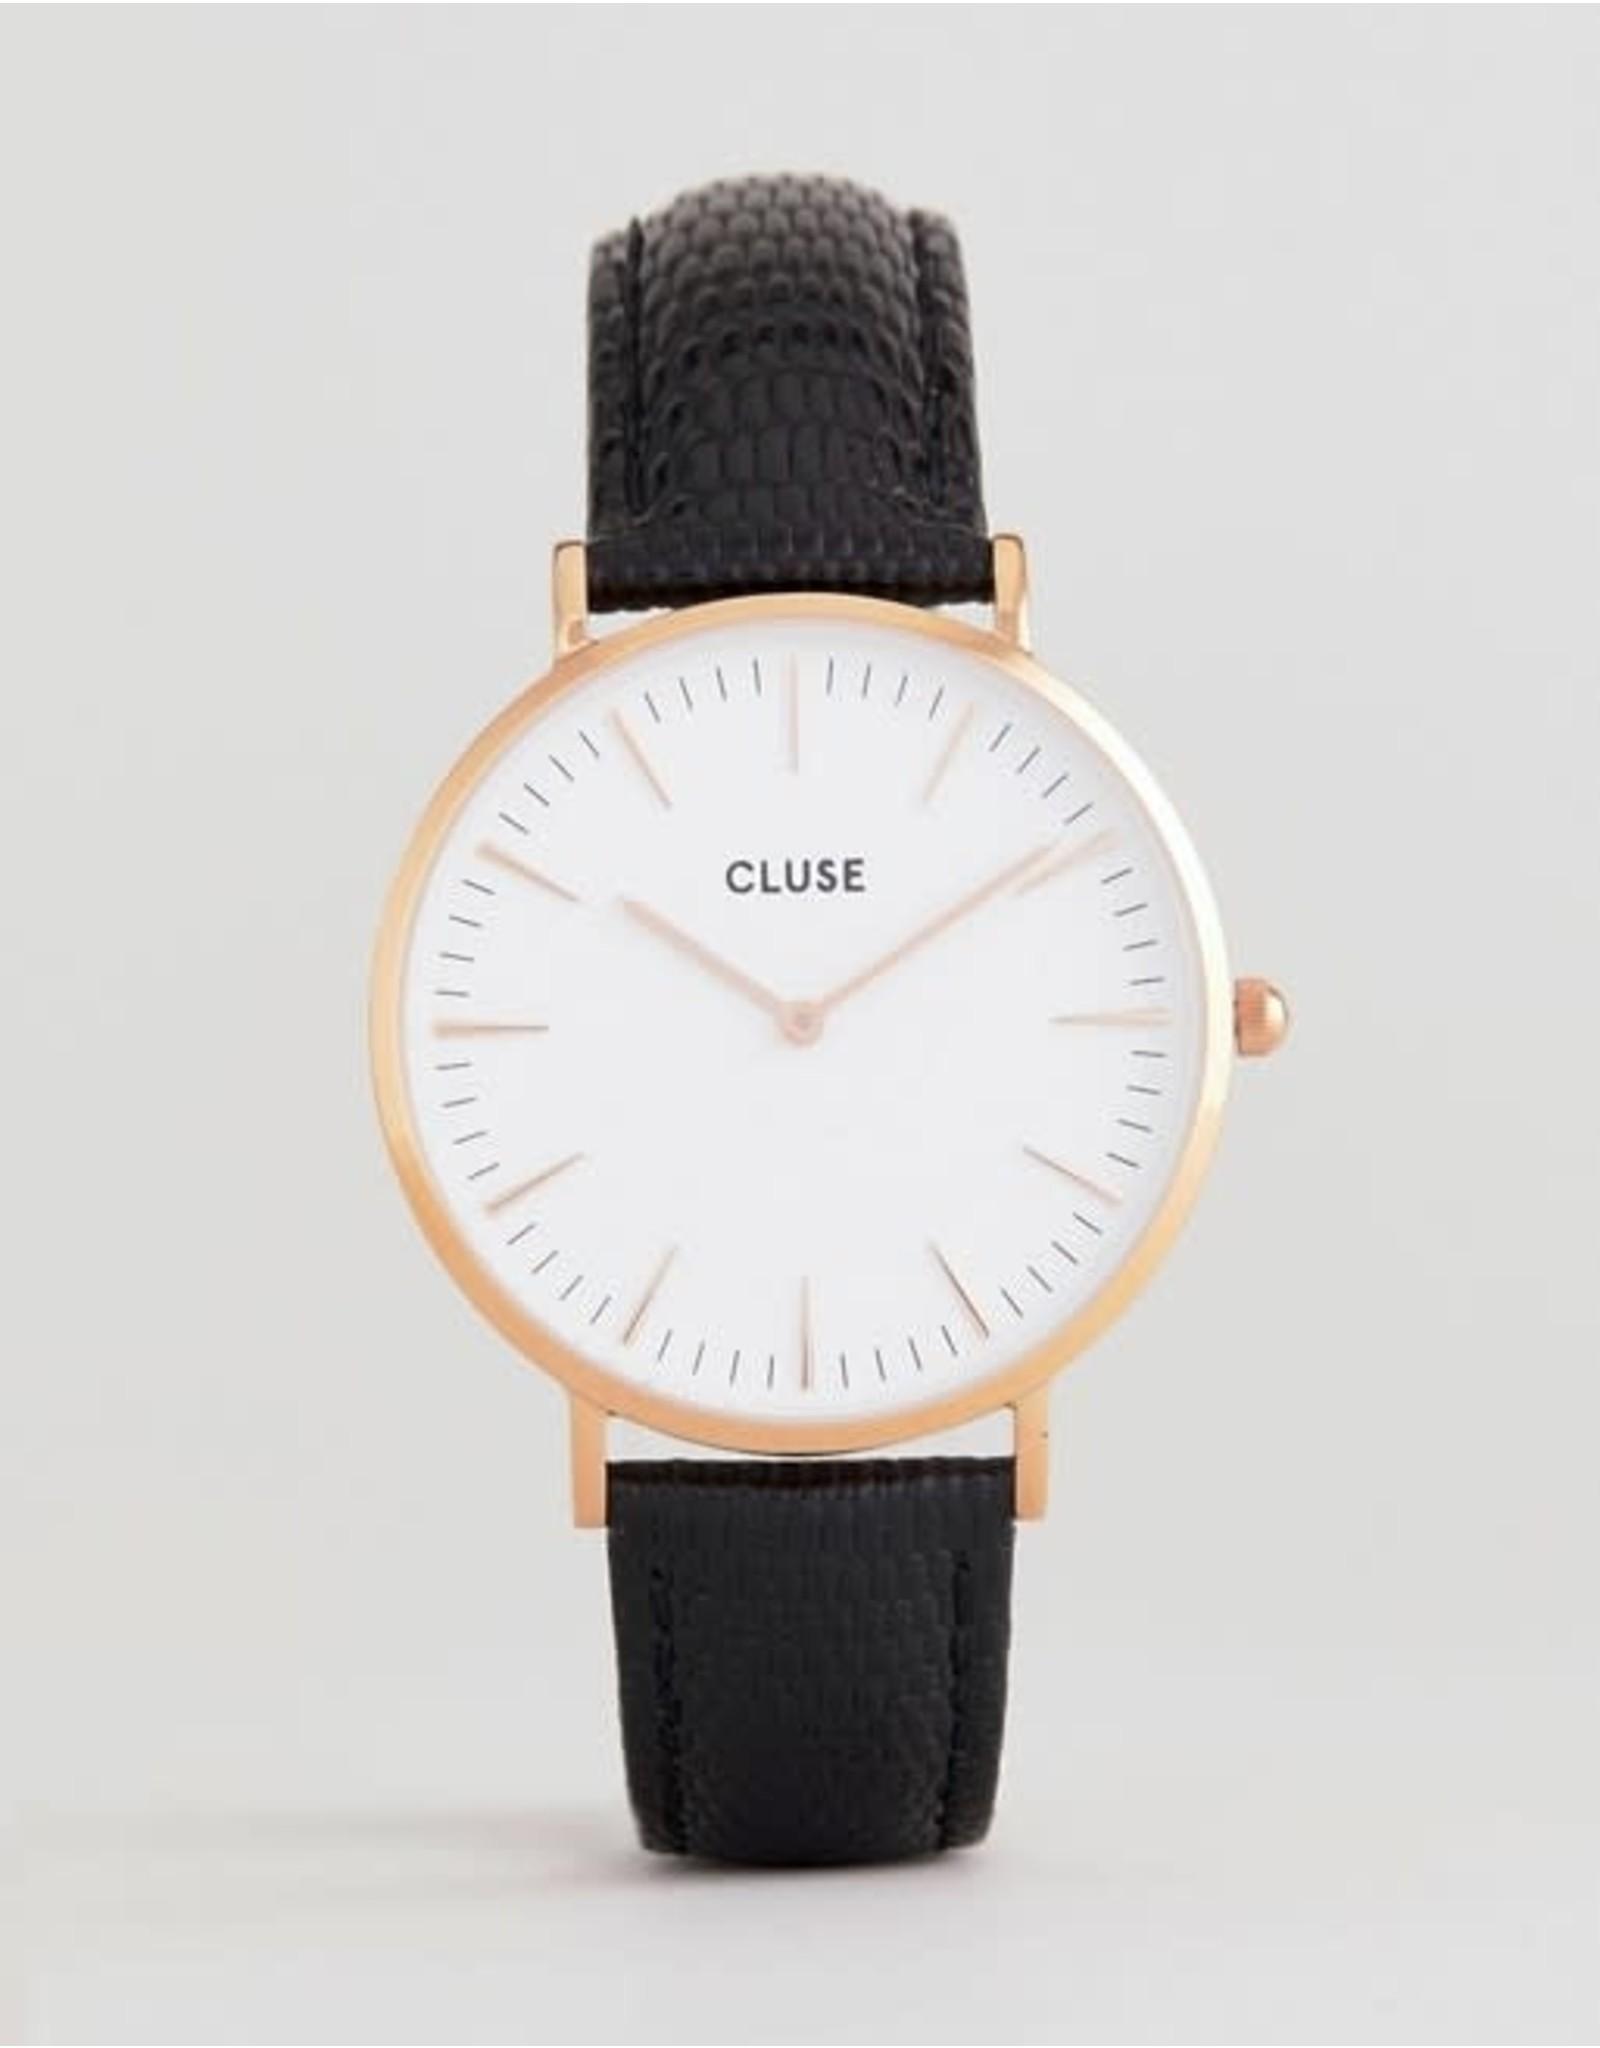 Cluse Cluse CL18037 Boho Chic Staal Roos - Zwart leder 38mm